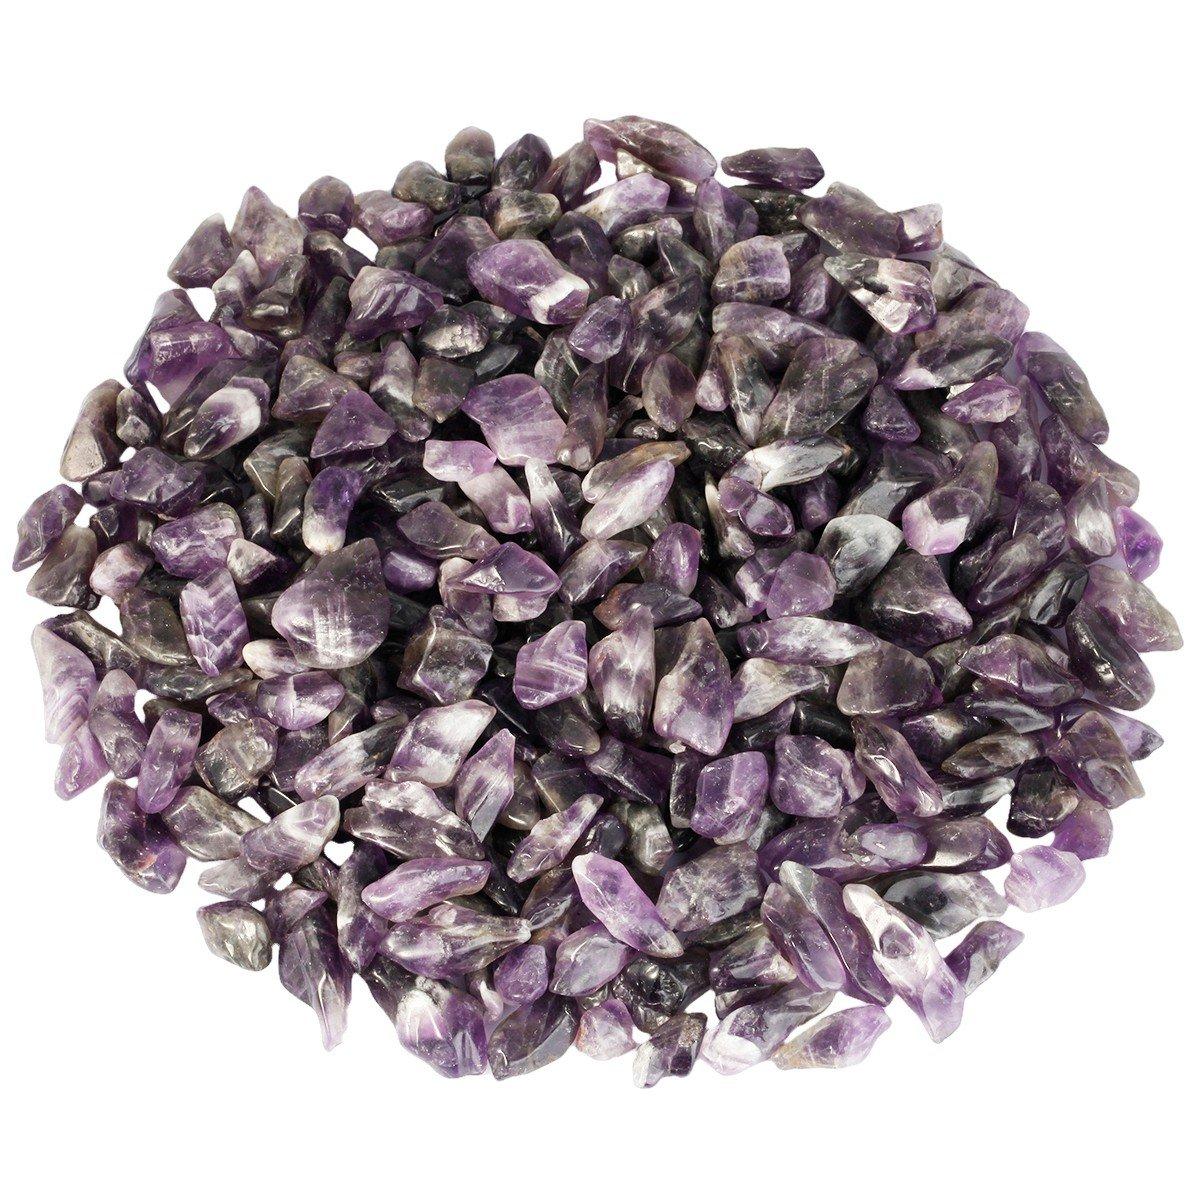 SUNYIK Natural Amethyst Quartz Tumbled Stone Polished Healing Crystal Pieces 0.3''-1.5'' 1lb(appox 460 grams)